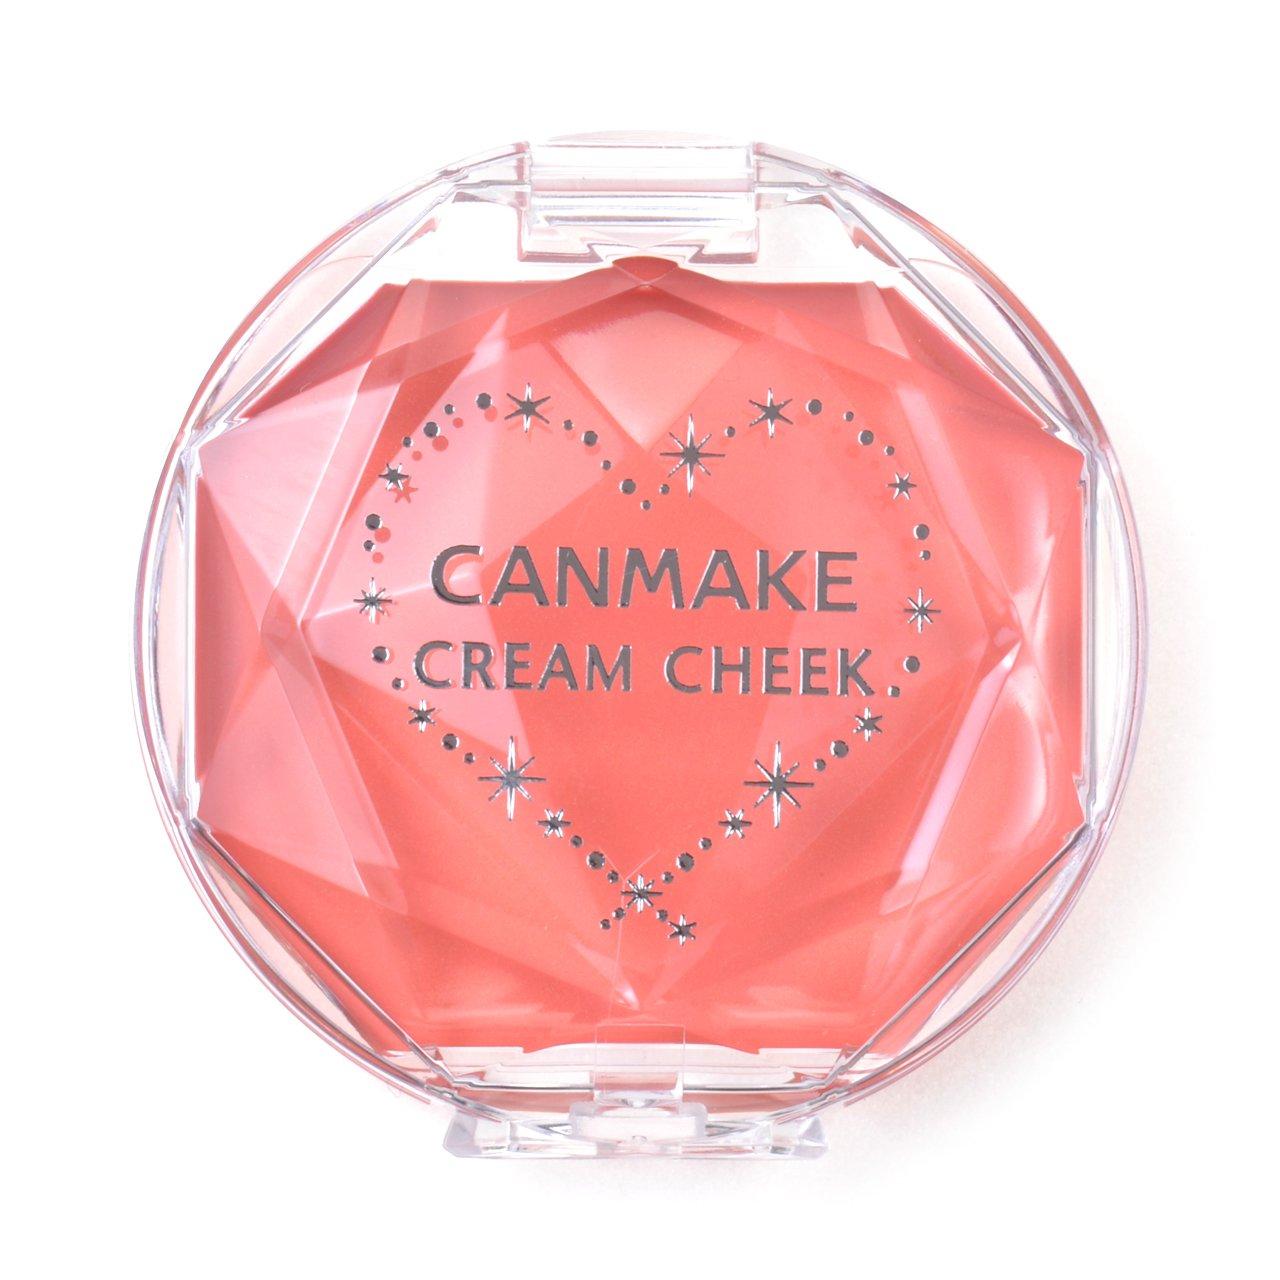 CANMAKE Cream Cheek, 07 Coral Orange, 1 Ounce 4901008303789